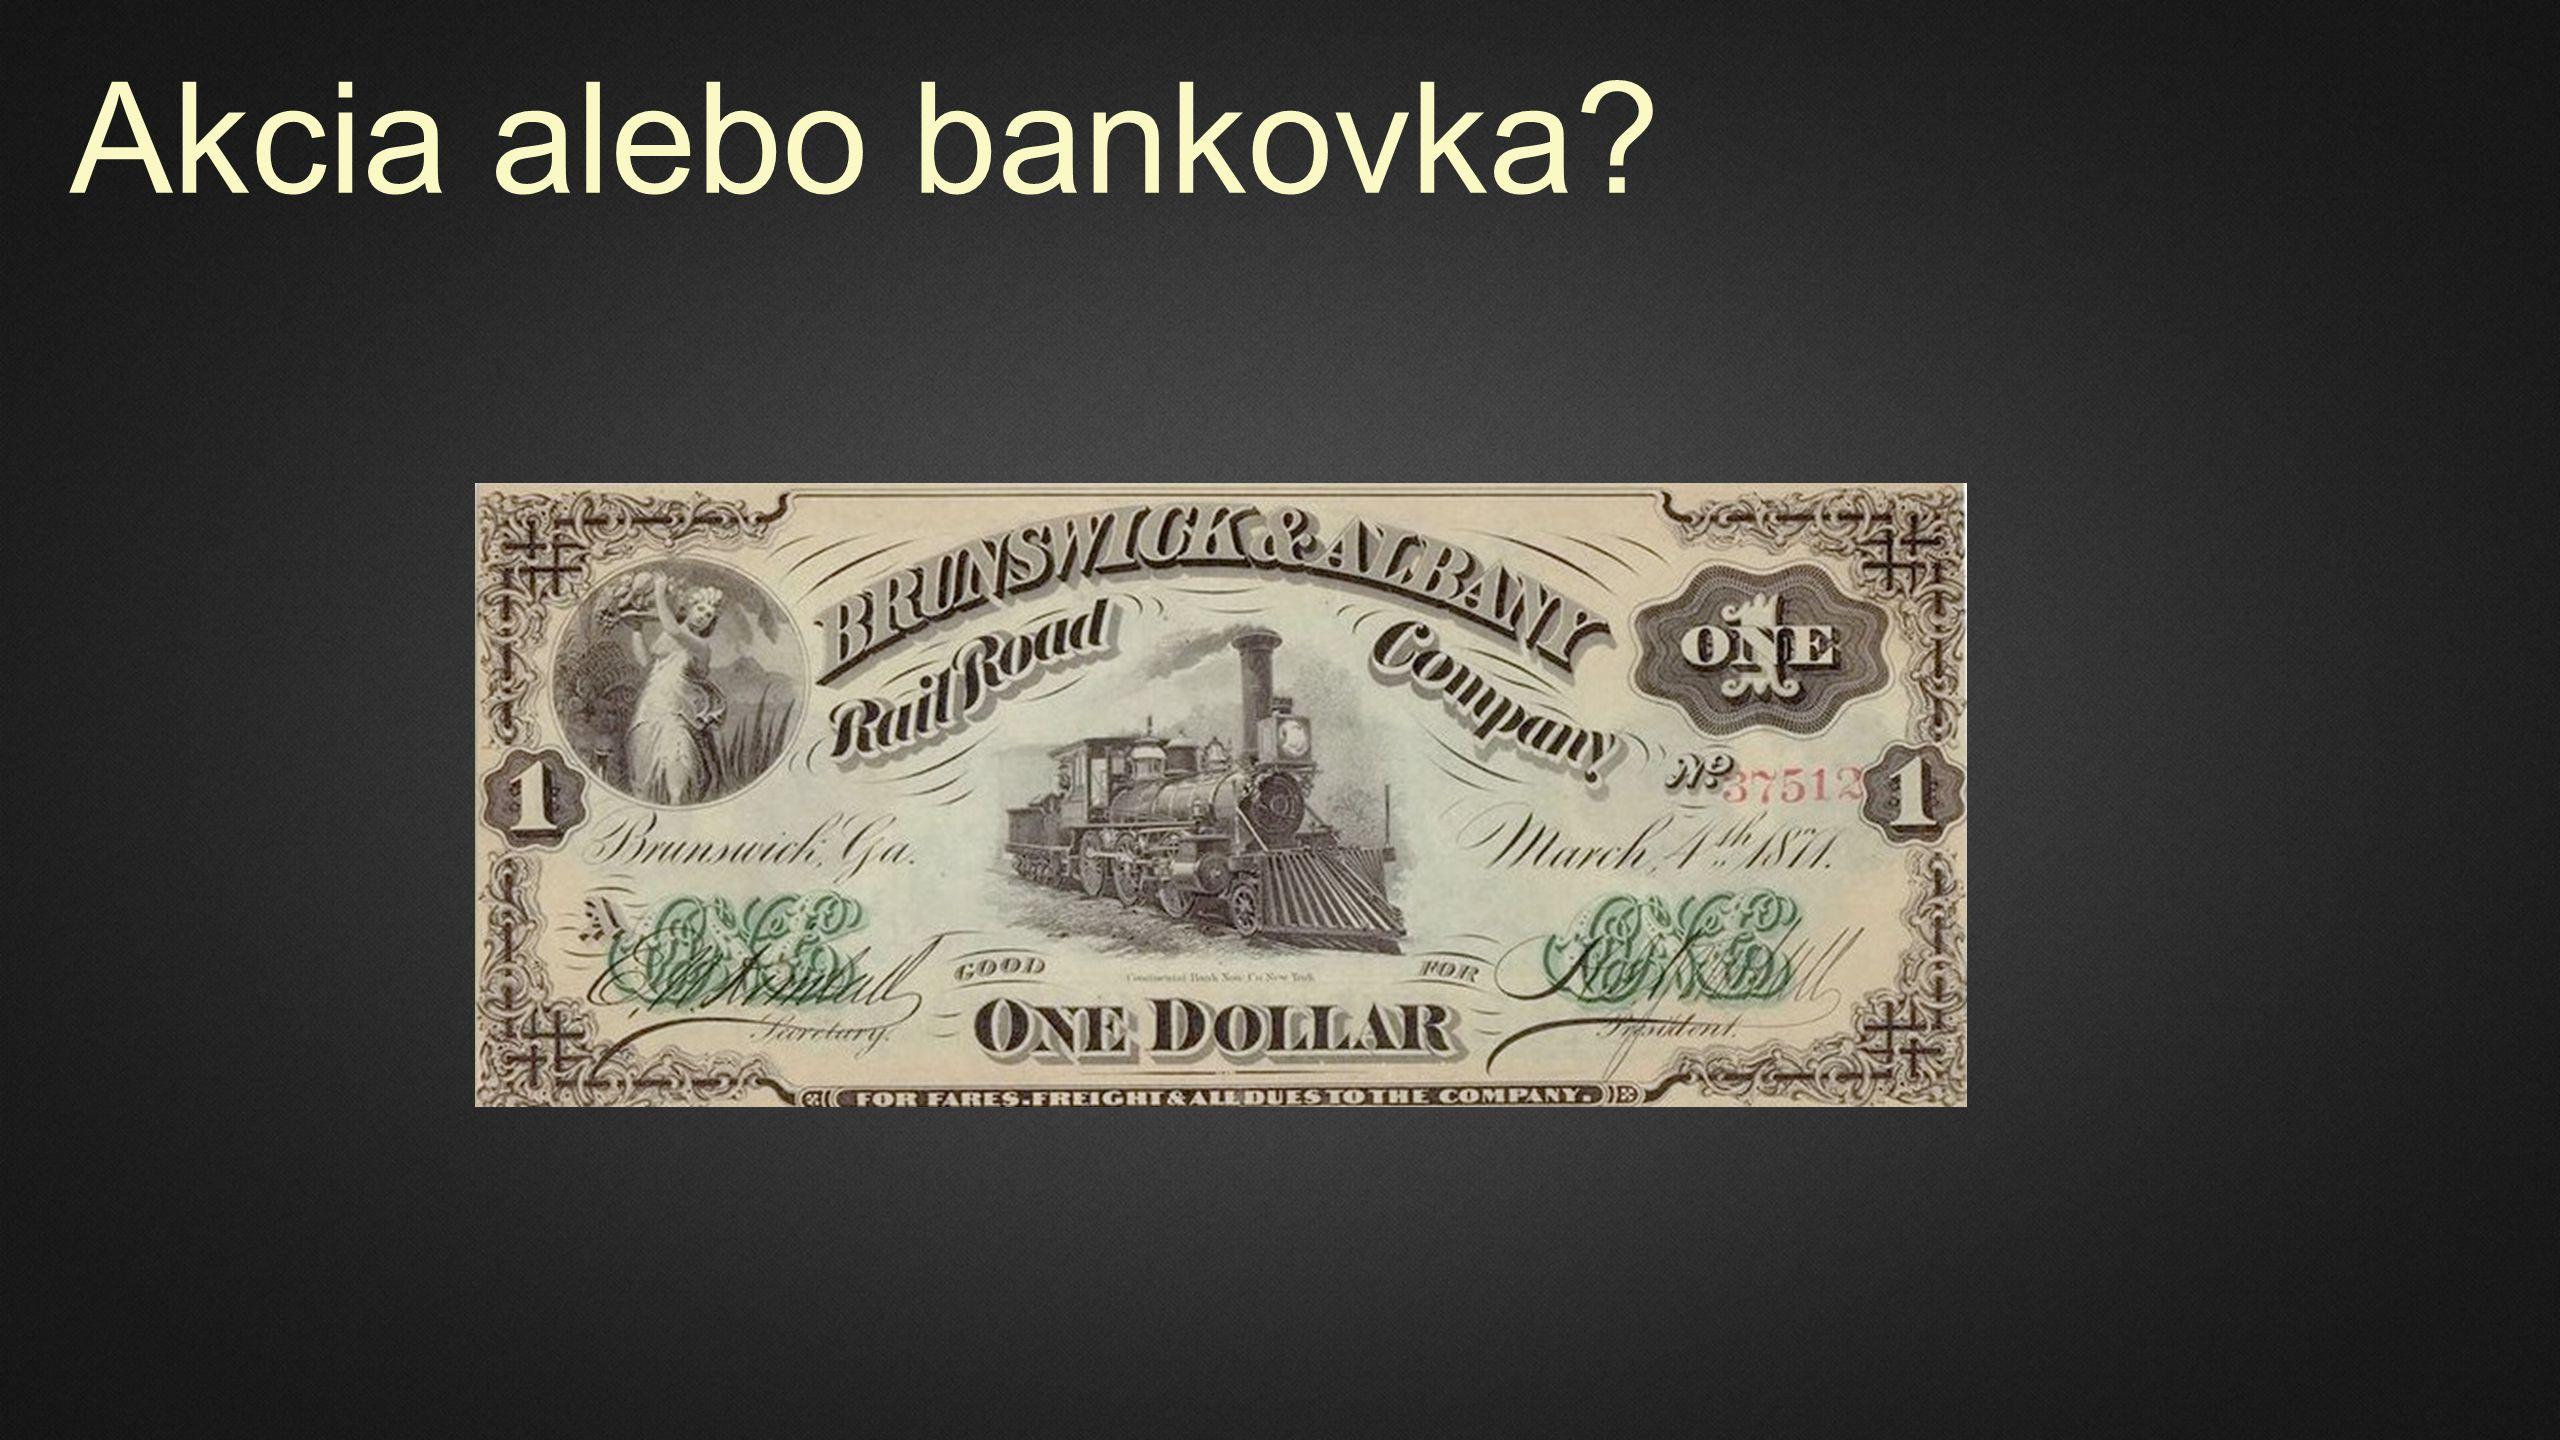 Akcia alebo bankovka?